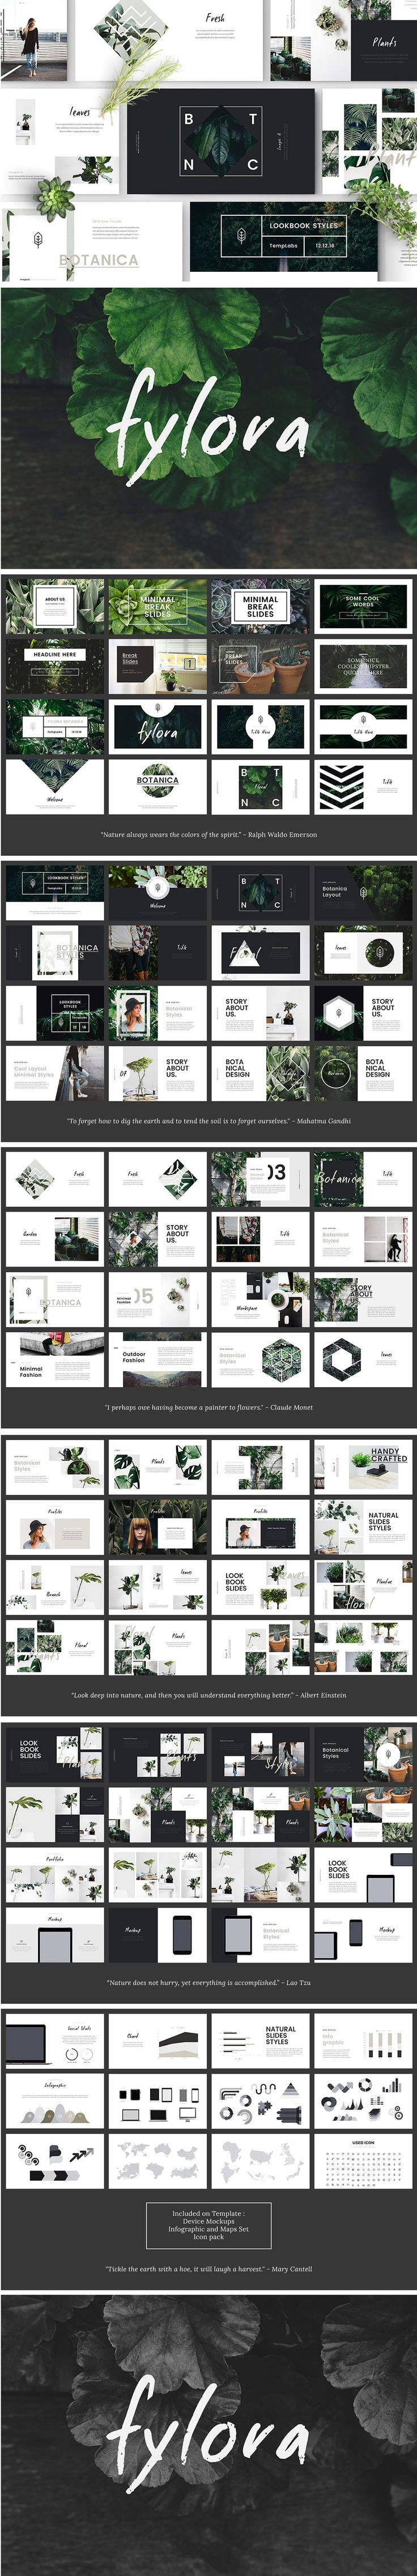 142 melhores imagens de powerpoint themes no pinterest fylora powerpoint template toneelgroepblik Image collections